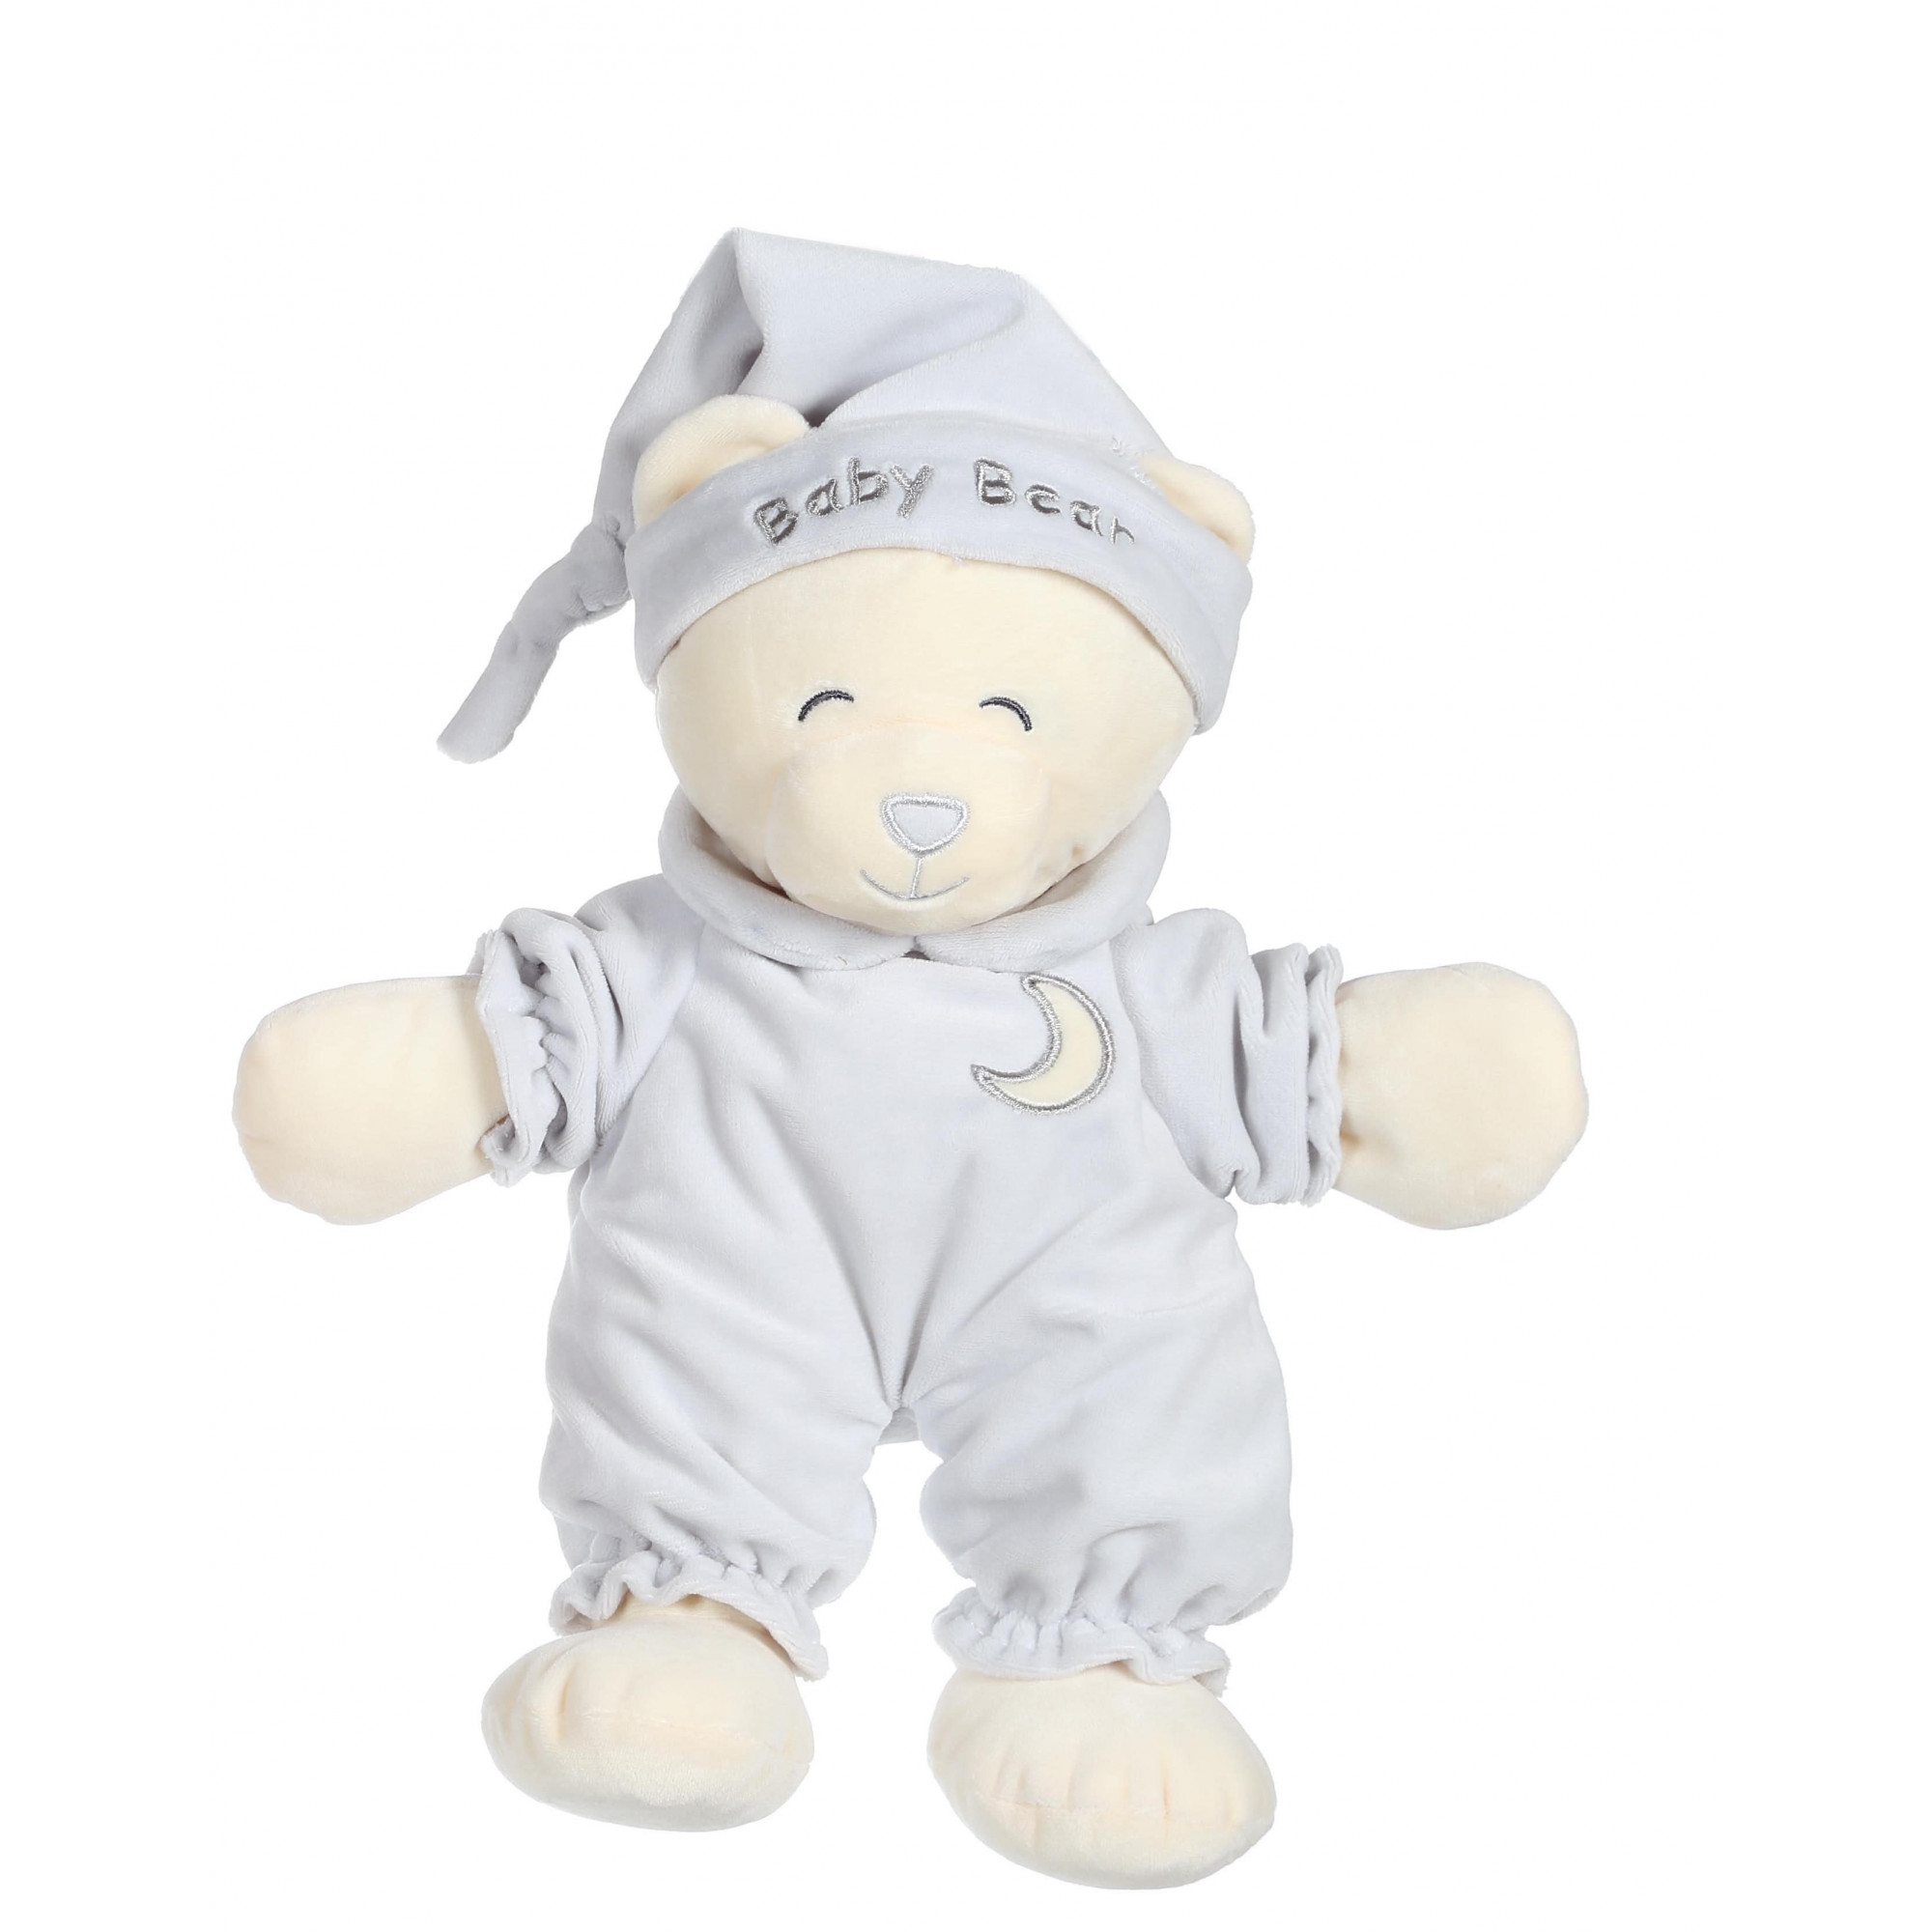 Ours Baby bear douceur gris - 24 cm